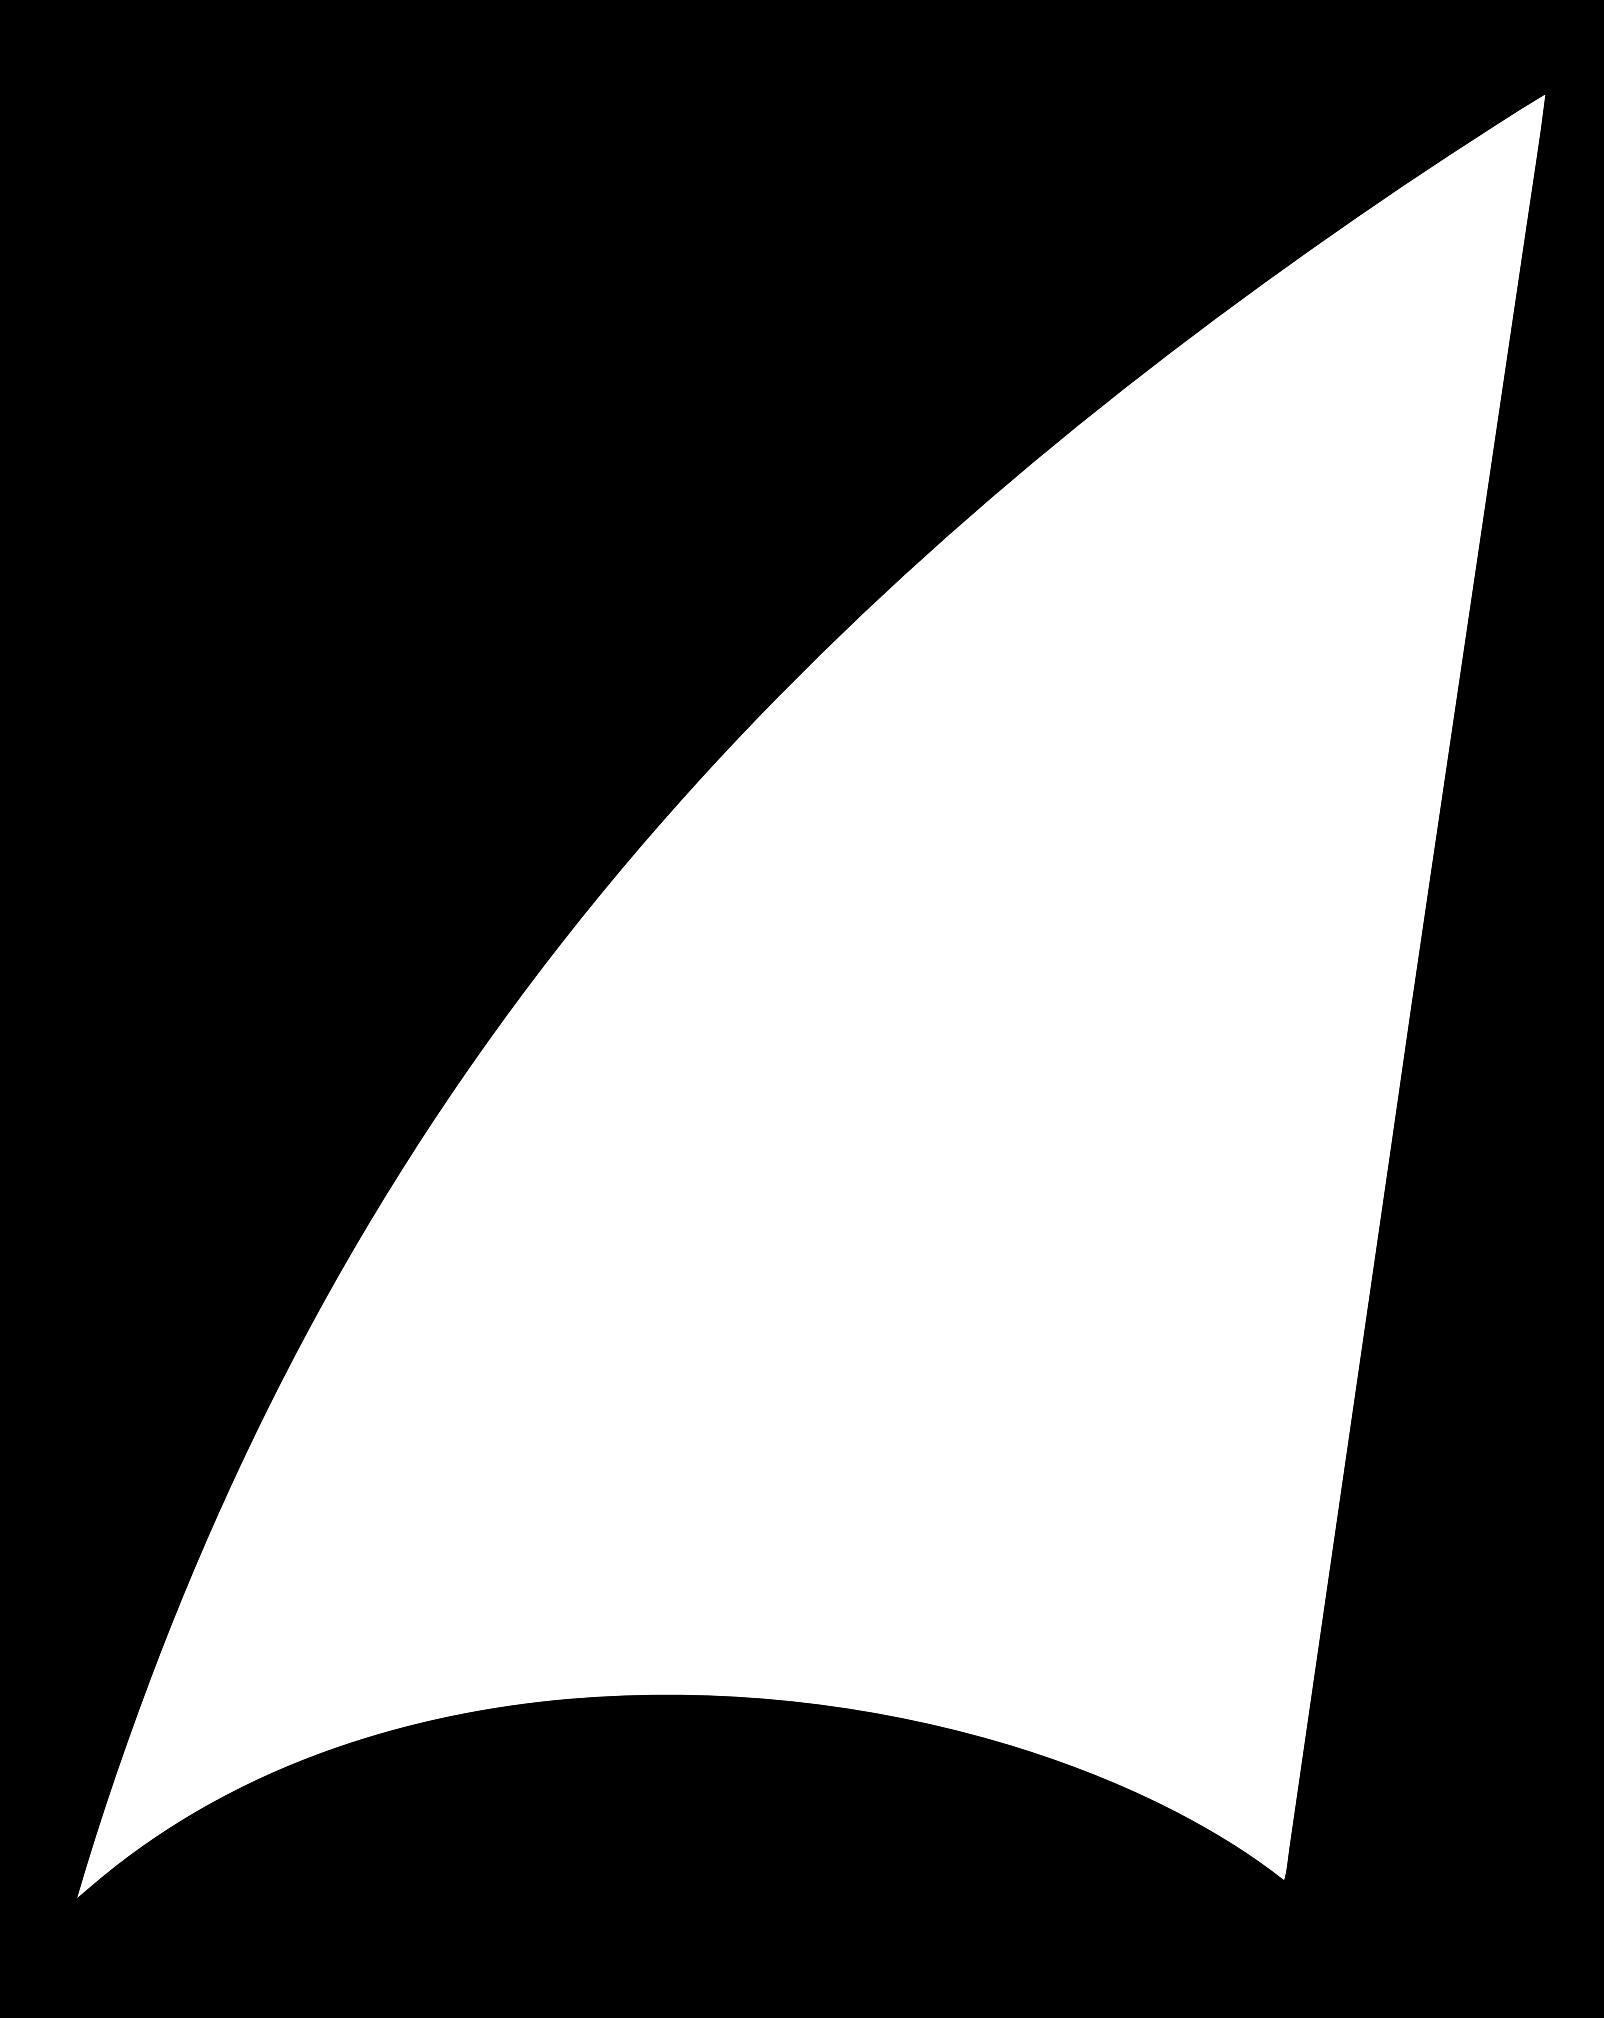 clip library download Sail clipart. Shark fin abstract big.